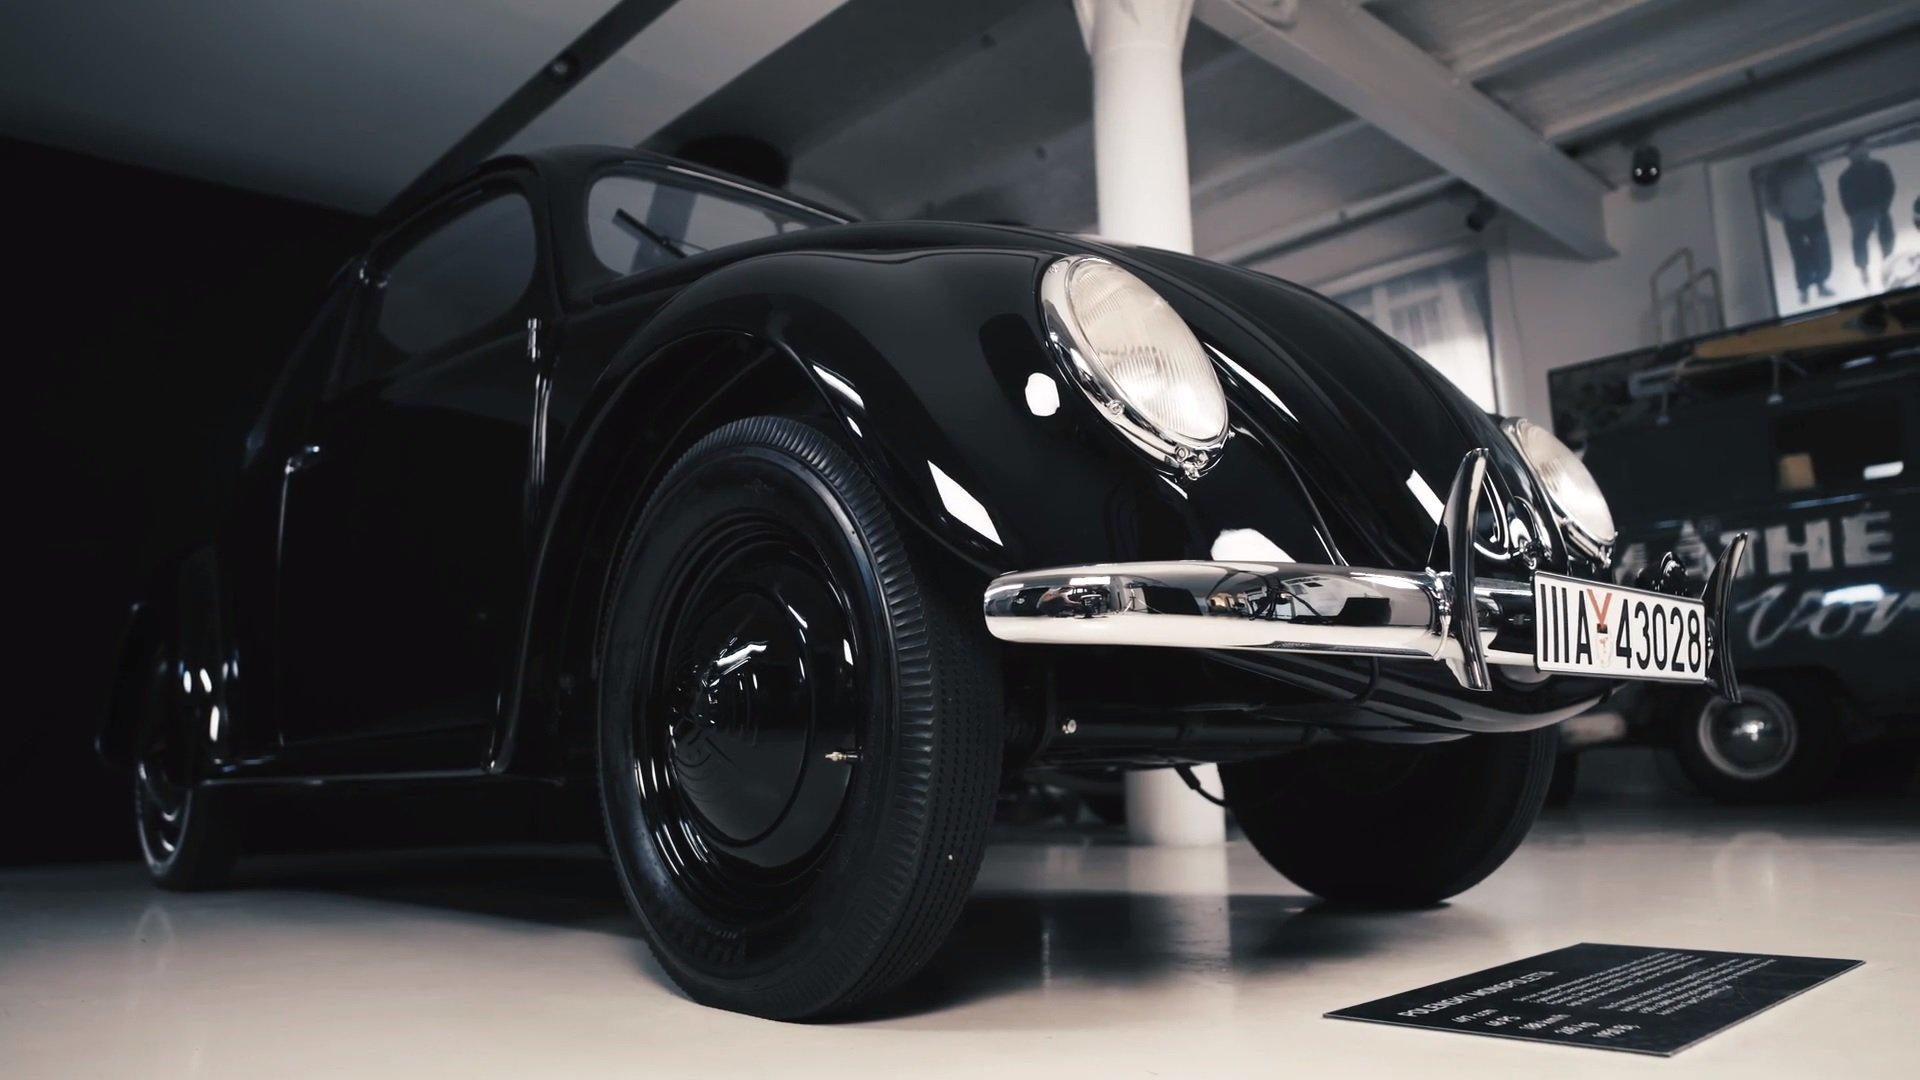 VW-39-2